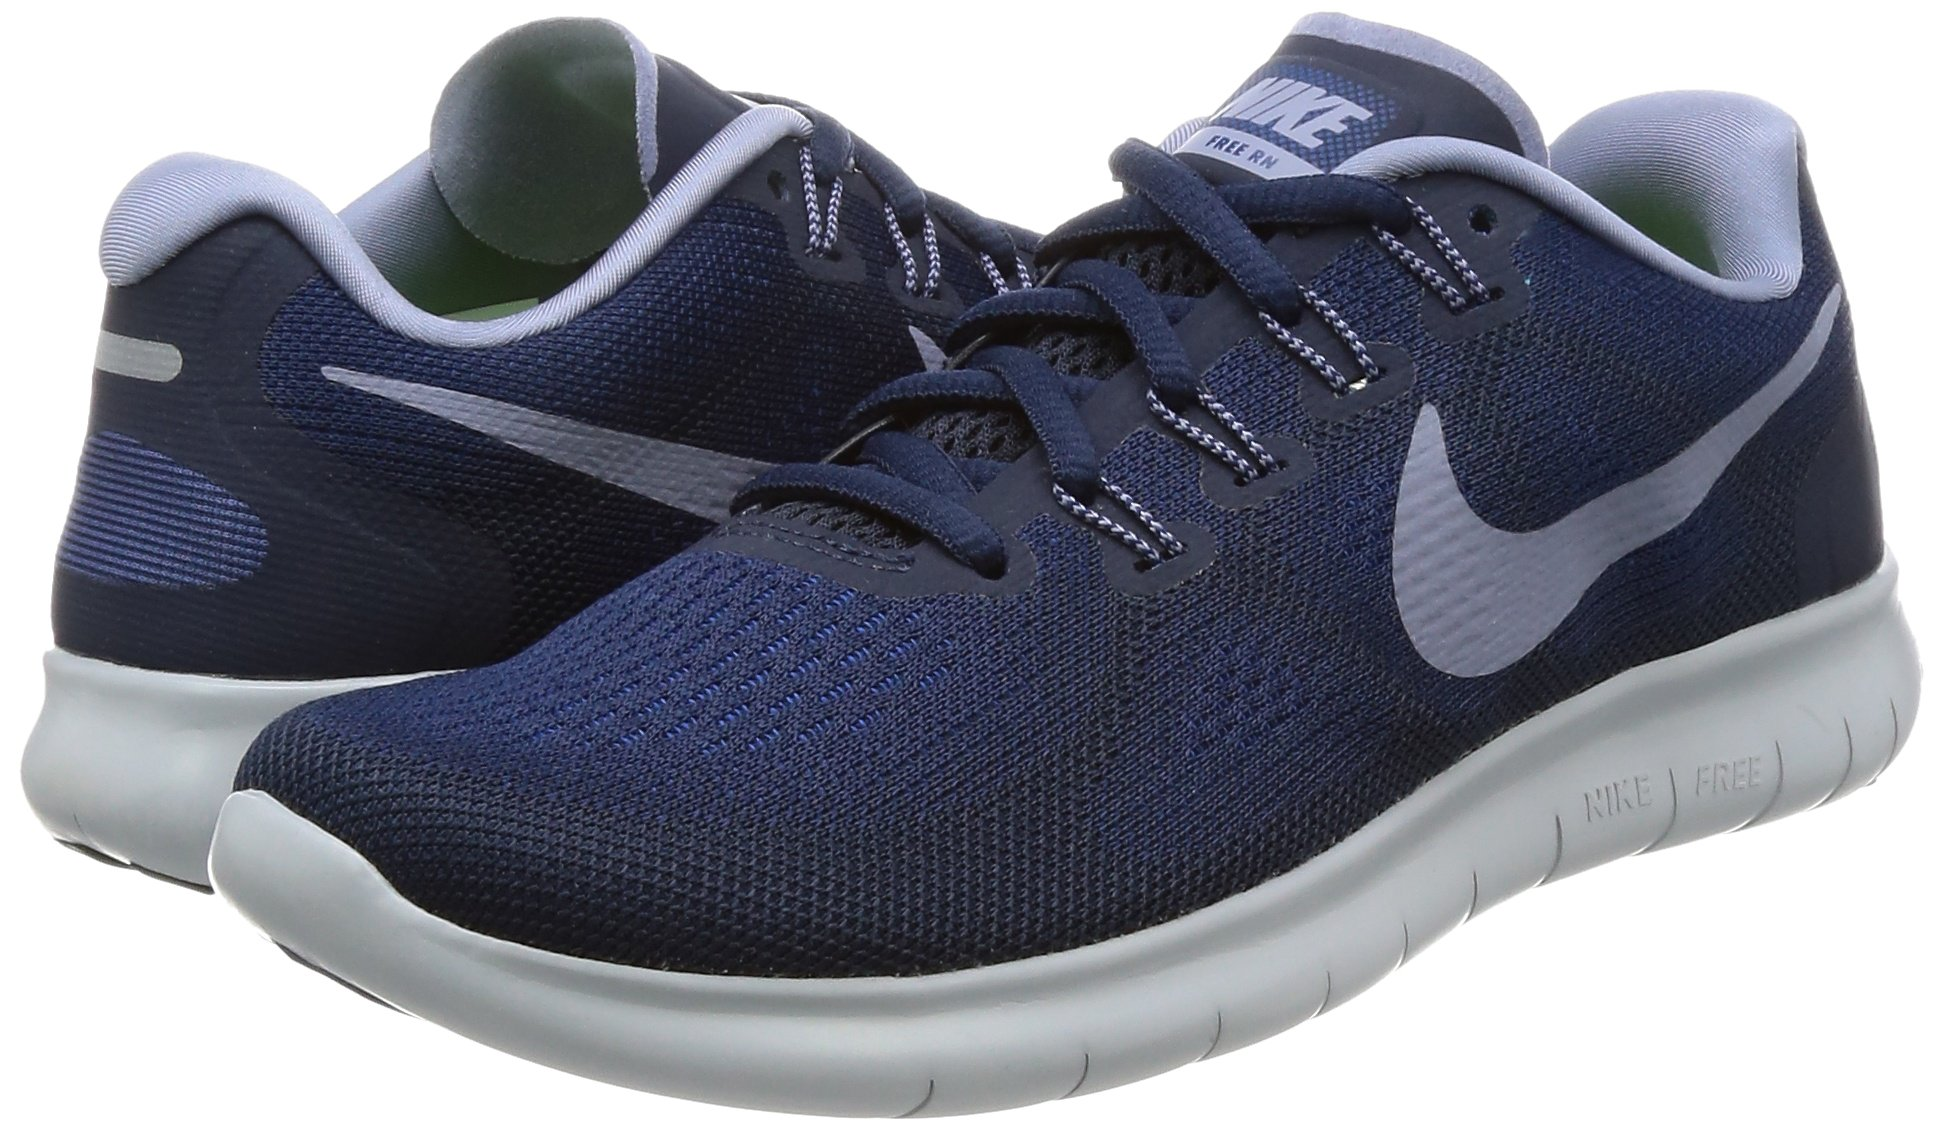 Nike Free RN 2017 Women's Running Shoes (6 M US, Binary Blue/Dark Sky Blue) by Nike (Image #5)